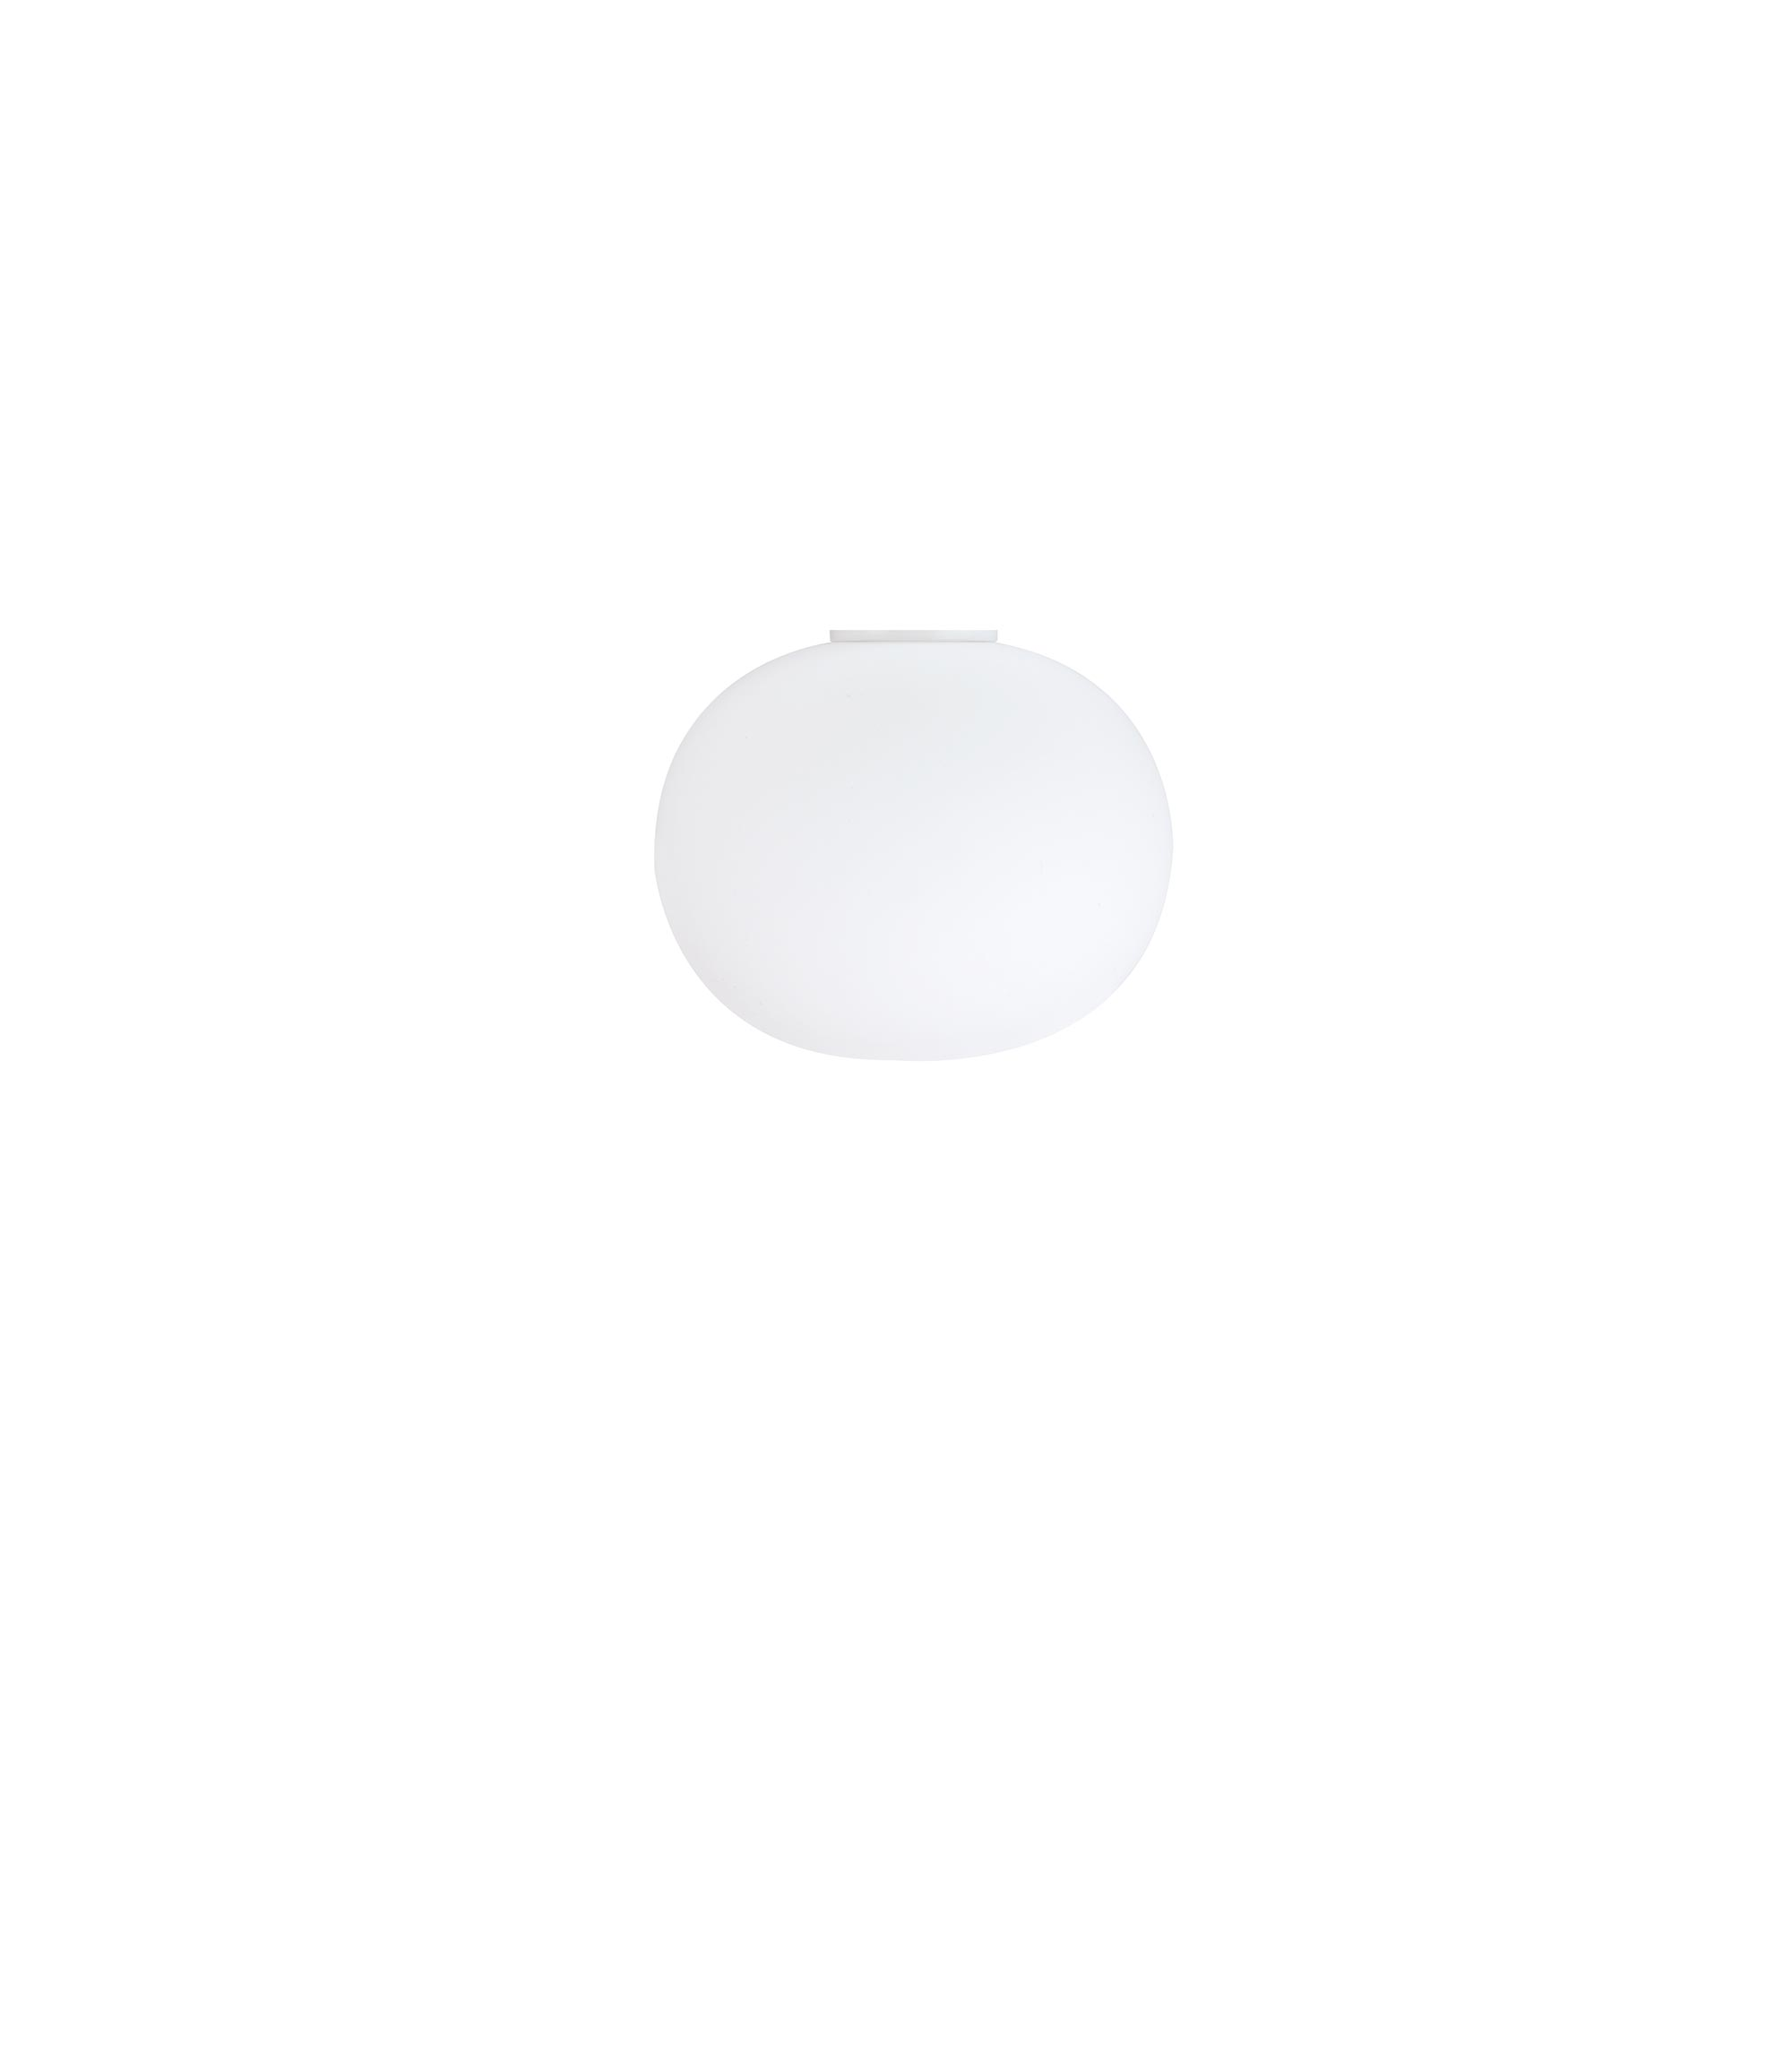 Glo ball ceiling wall 0 morrison flos F3335009 product still life big 1